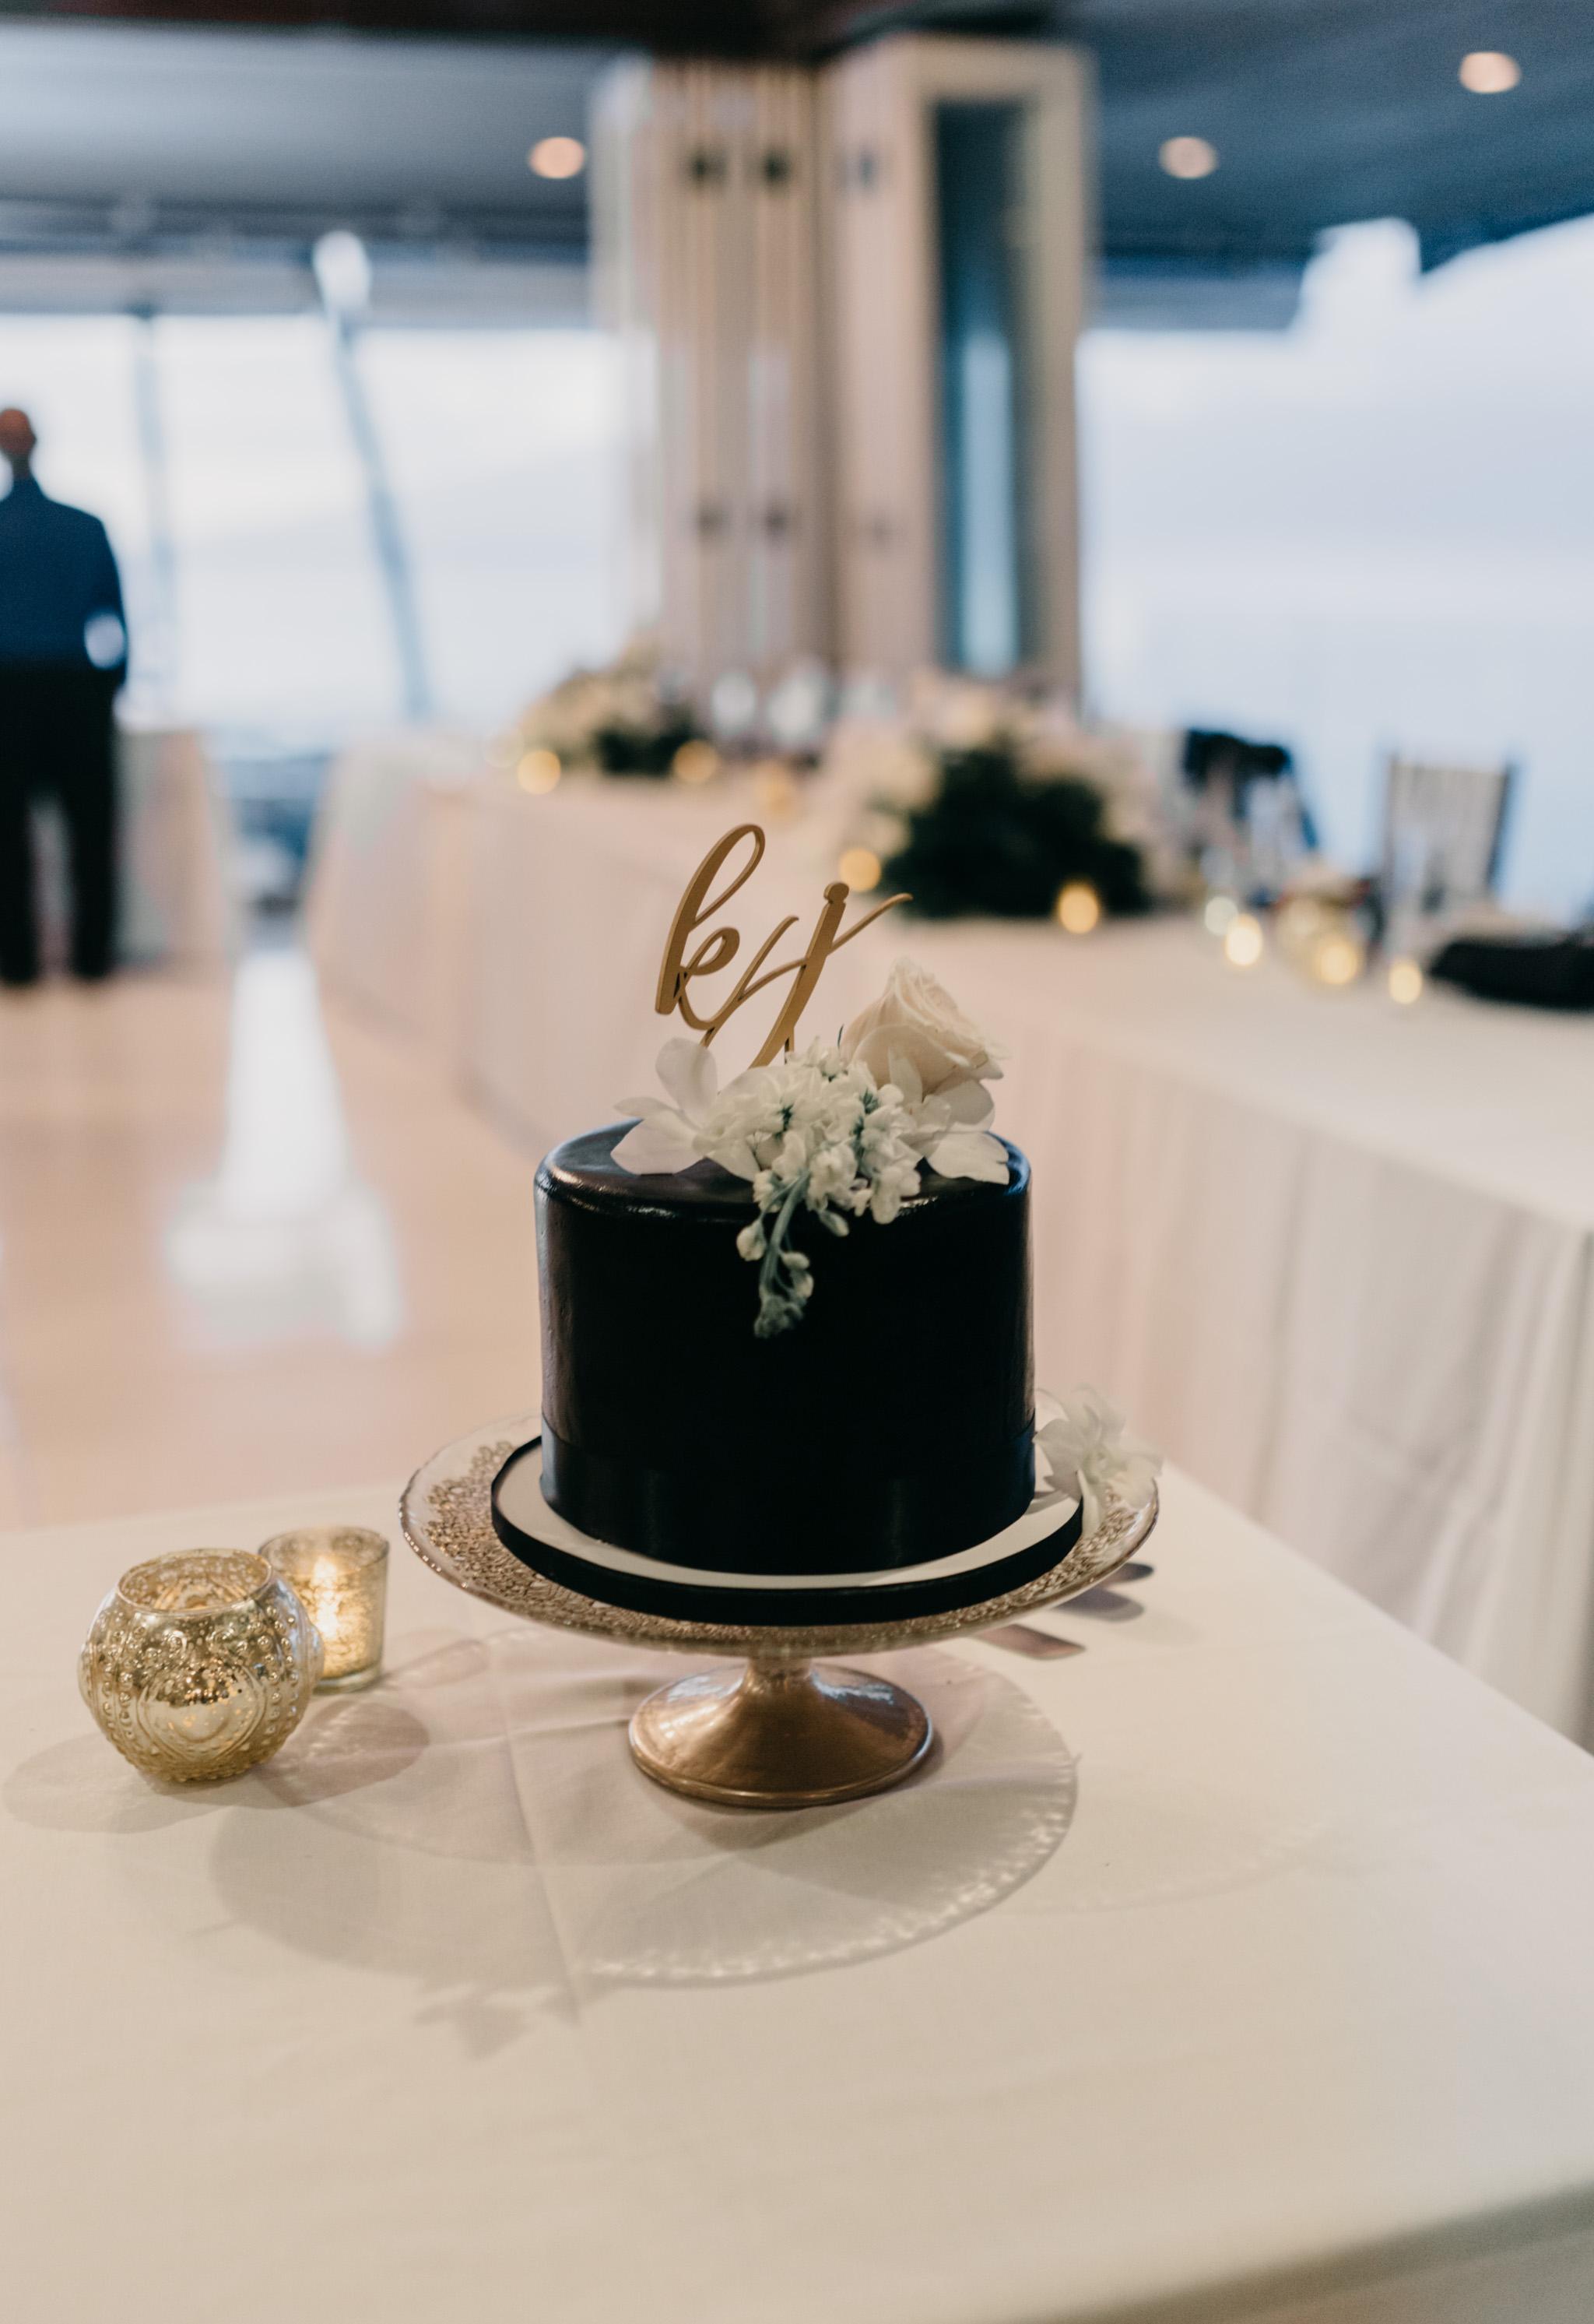 Black wedding cake   Merriman's Kapalua Maui wedding by Hawaii wedding photographer Desiree Leilani